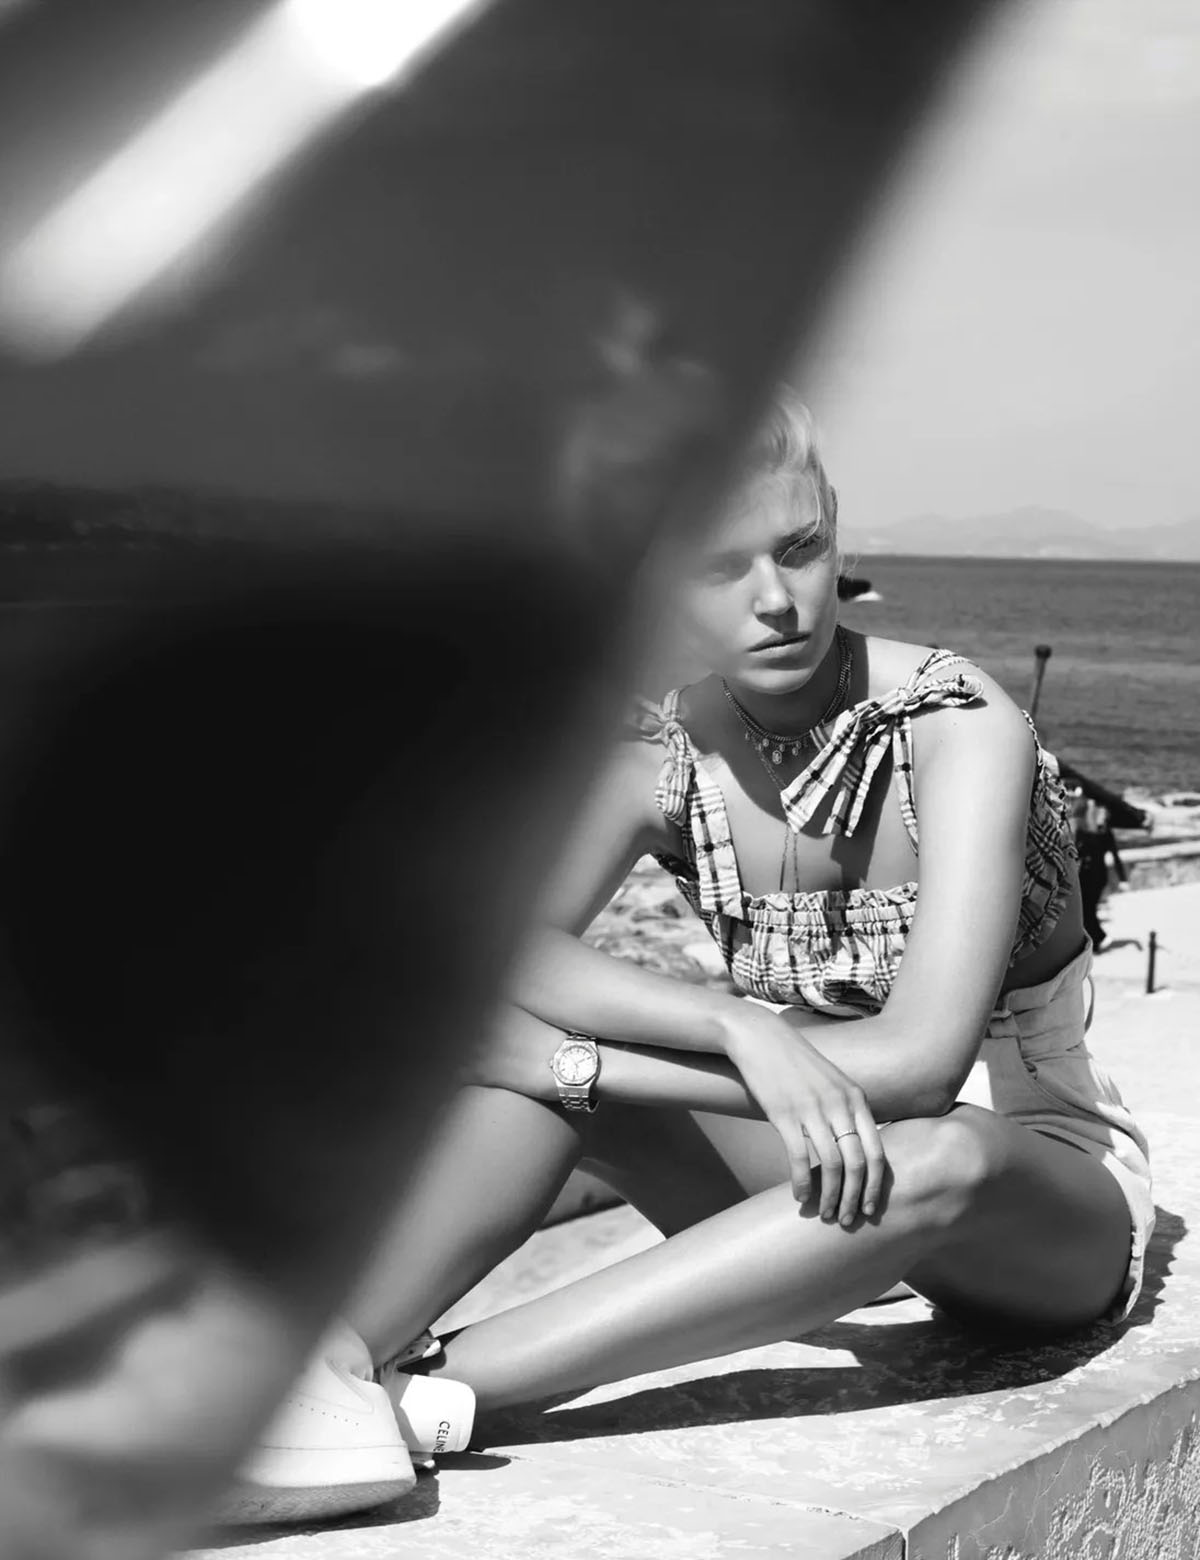 Ola Rudnicka by Sabine Villiard for Madame Figaro May 21st, 2021